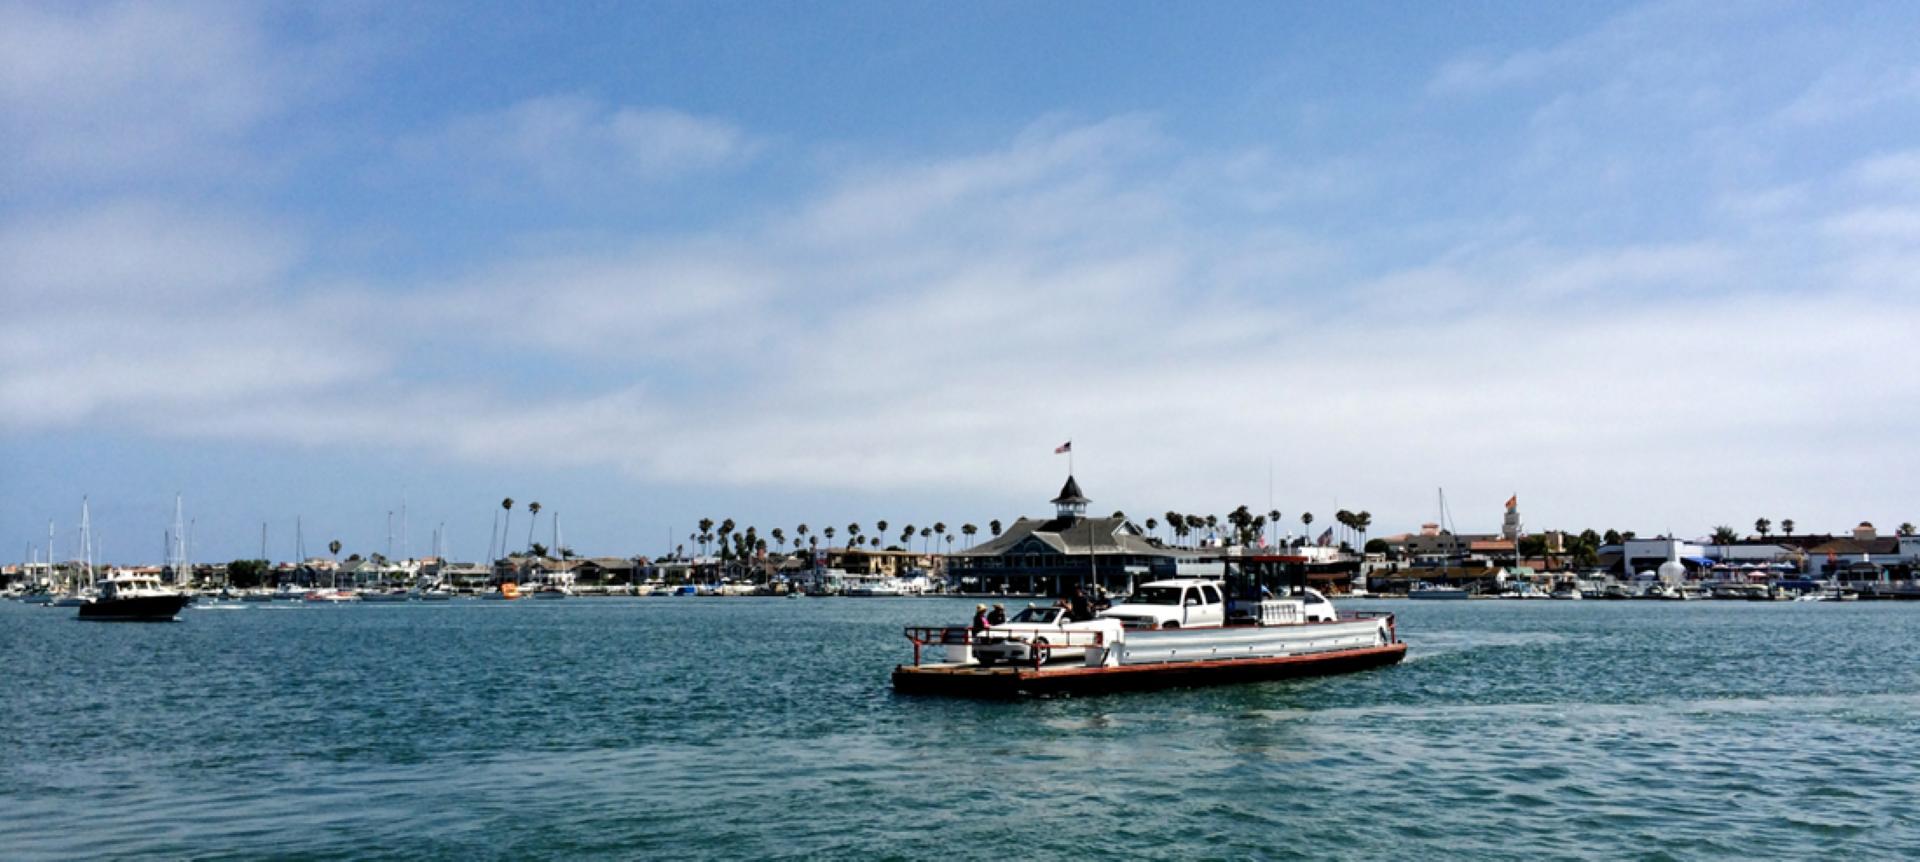 20 Jan Balboa Island Ferry